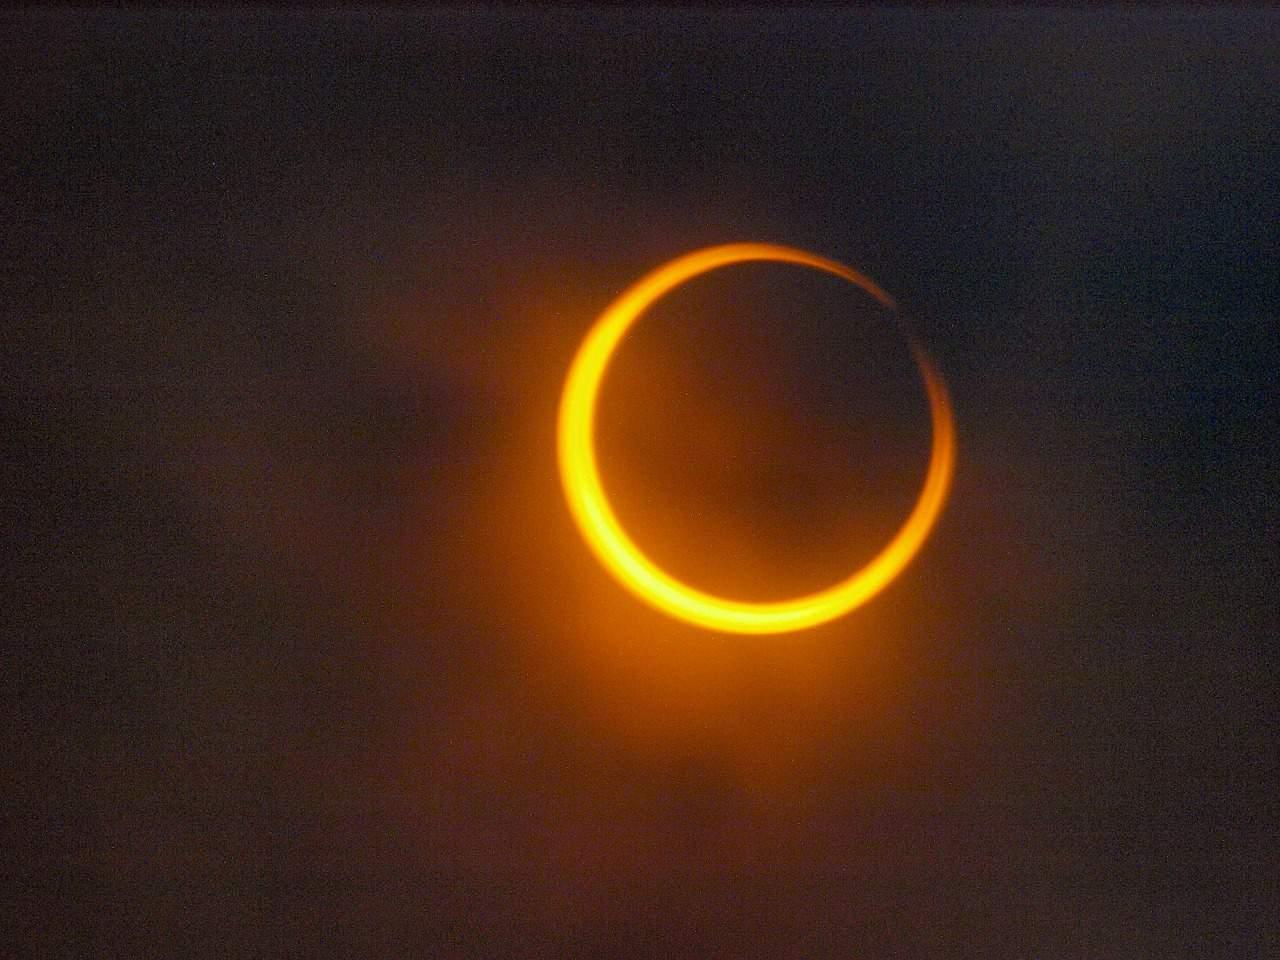 annular solar eclipse, eclipse facts